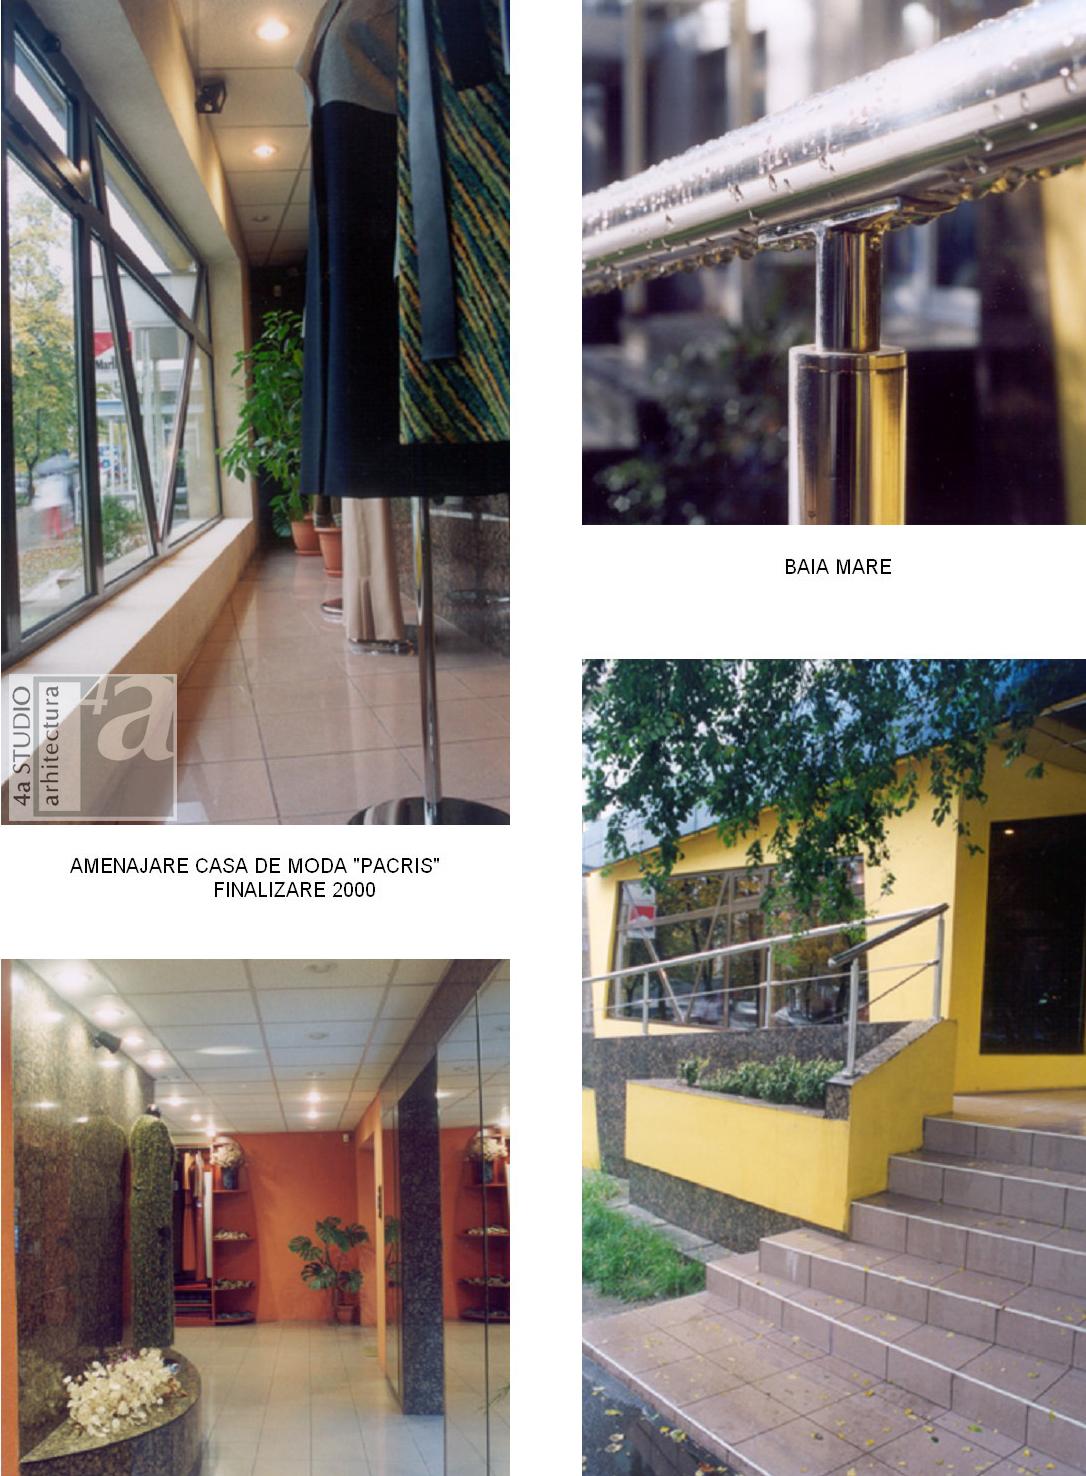 Amenajare casa de moda PACRIS - Baia Mare  - Poza 2